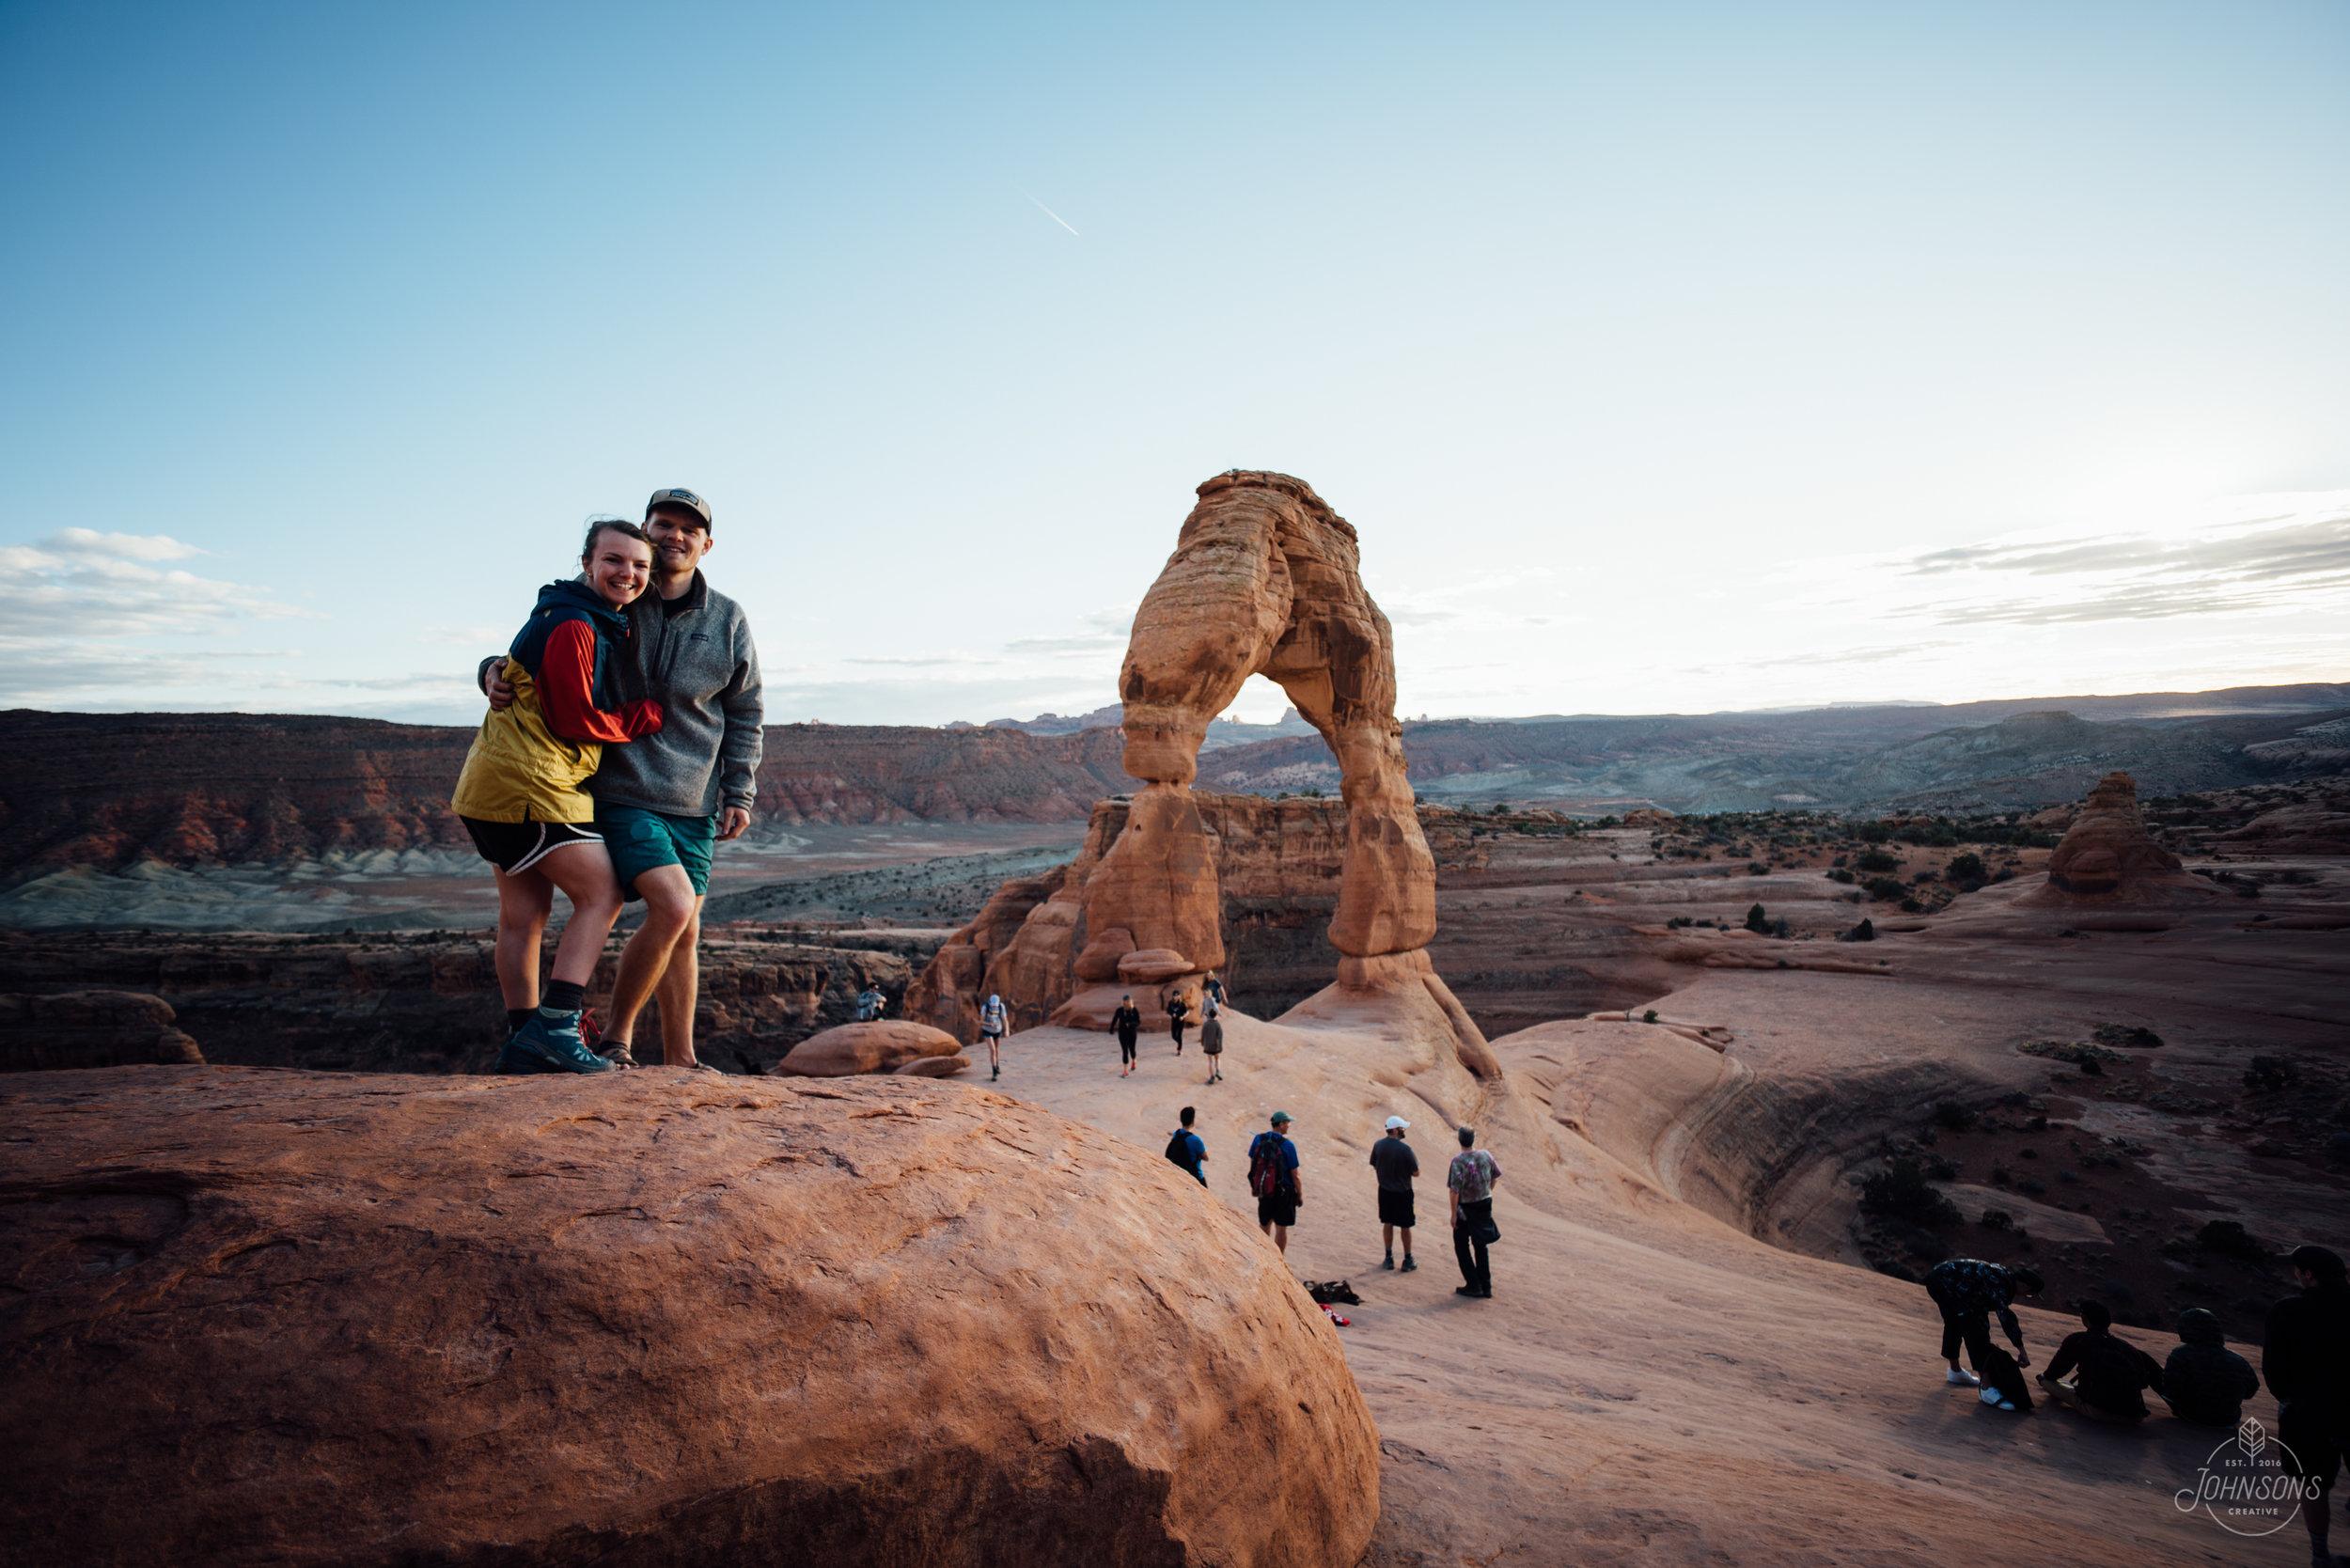 johnsonscreative-moab-travel-photography-recap-7.jpg